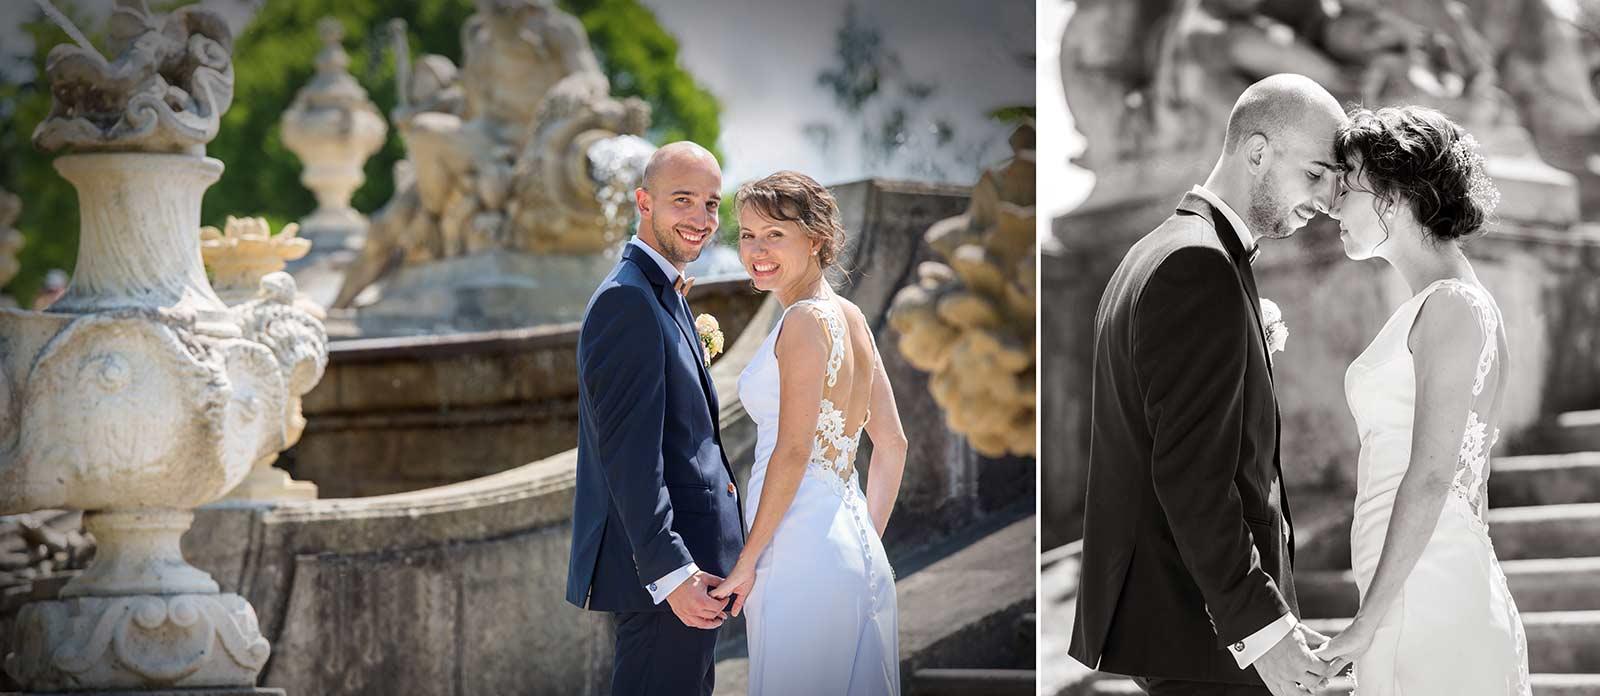 20 aranzovane svatebni foto cesky krumlov svatebni fotograf ales motejl jihocesky kraj